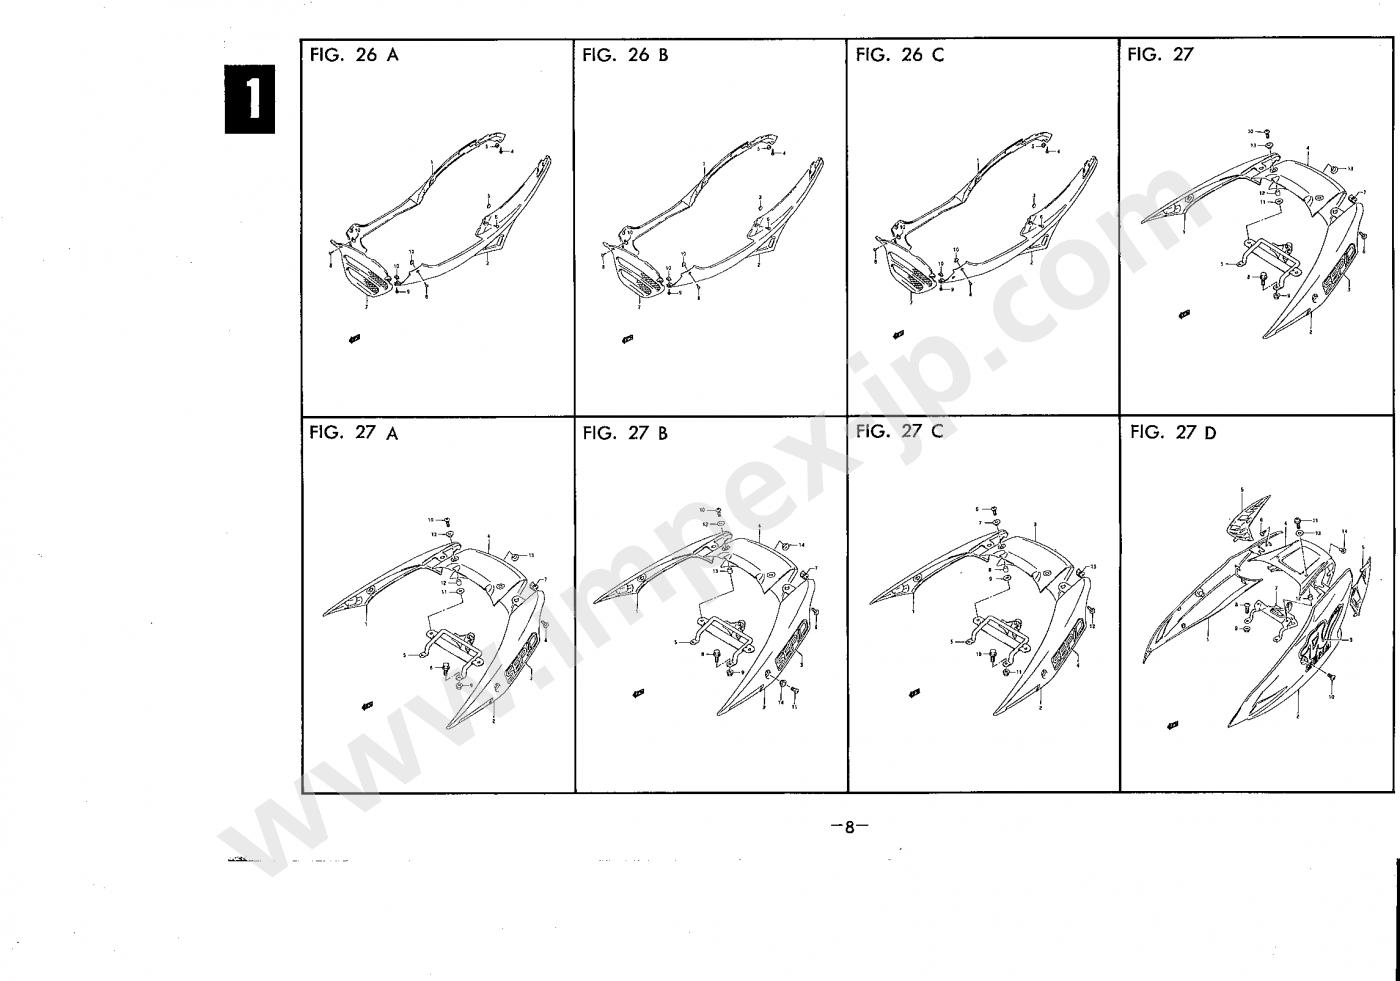 suzuki sepia service manual pdf